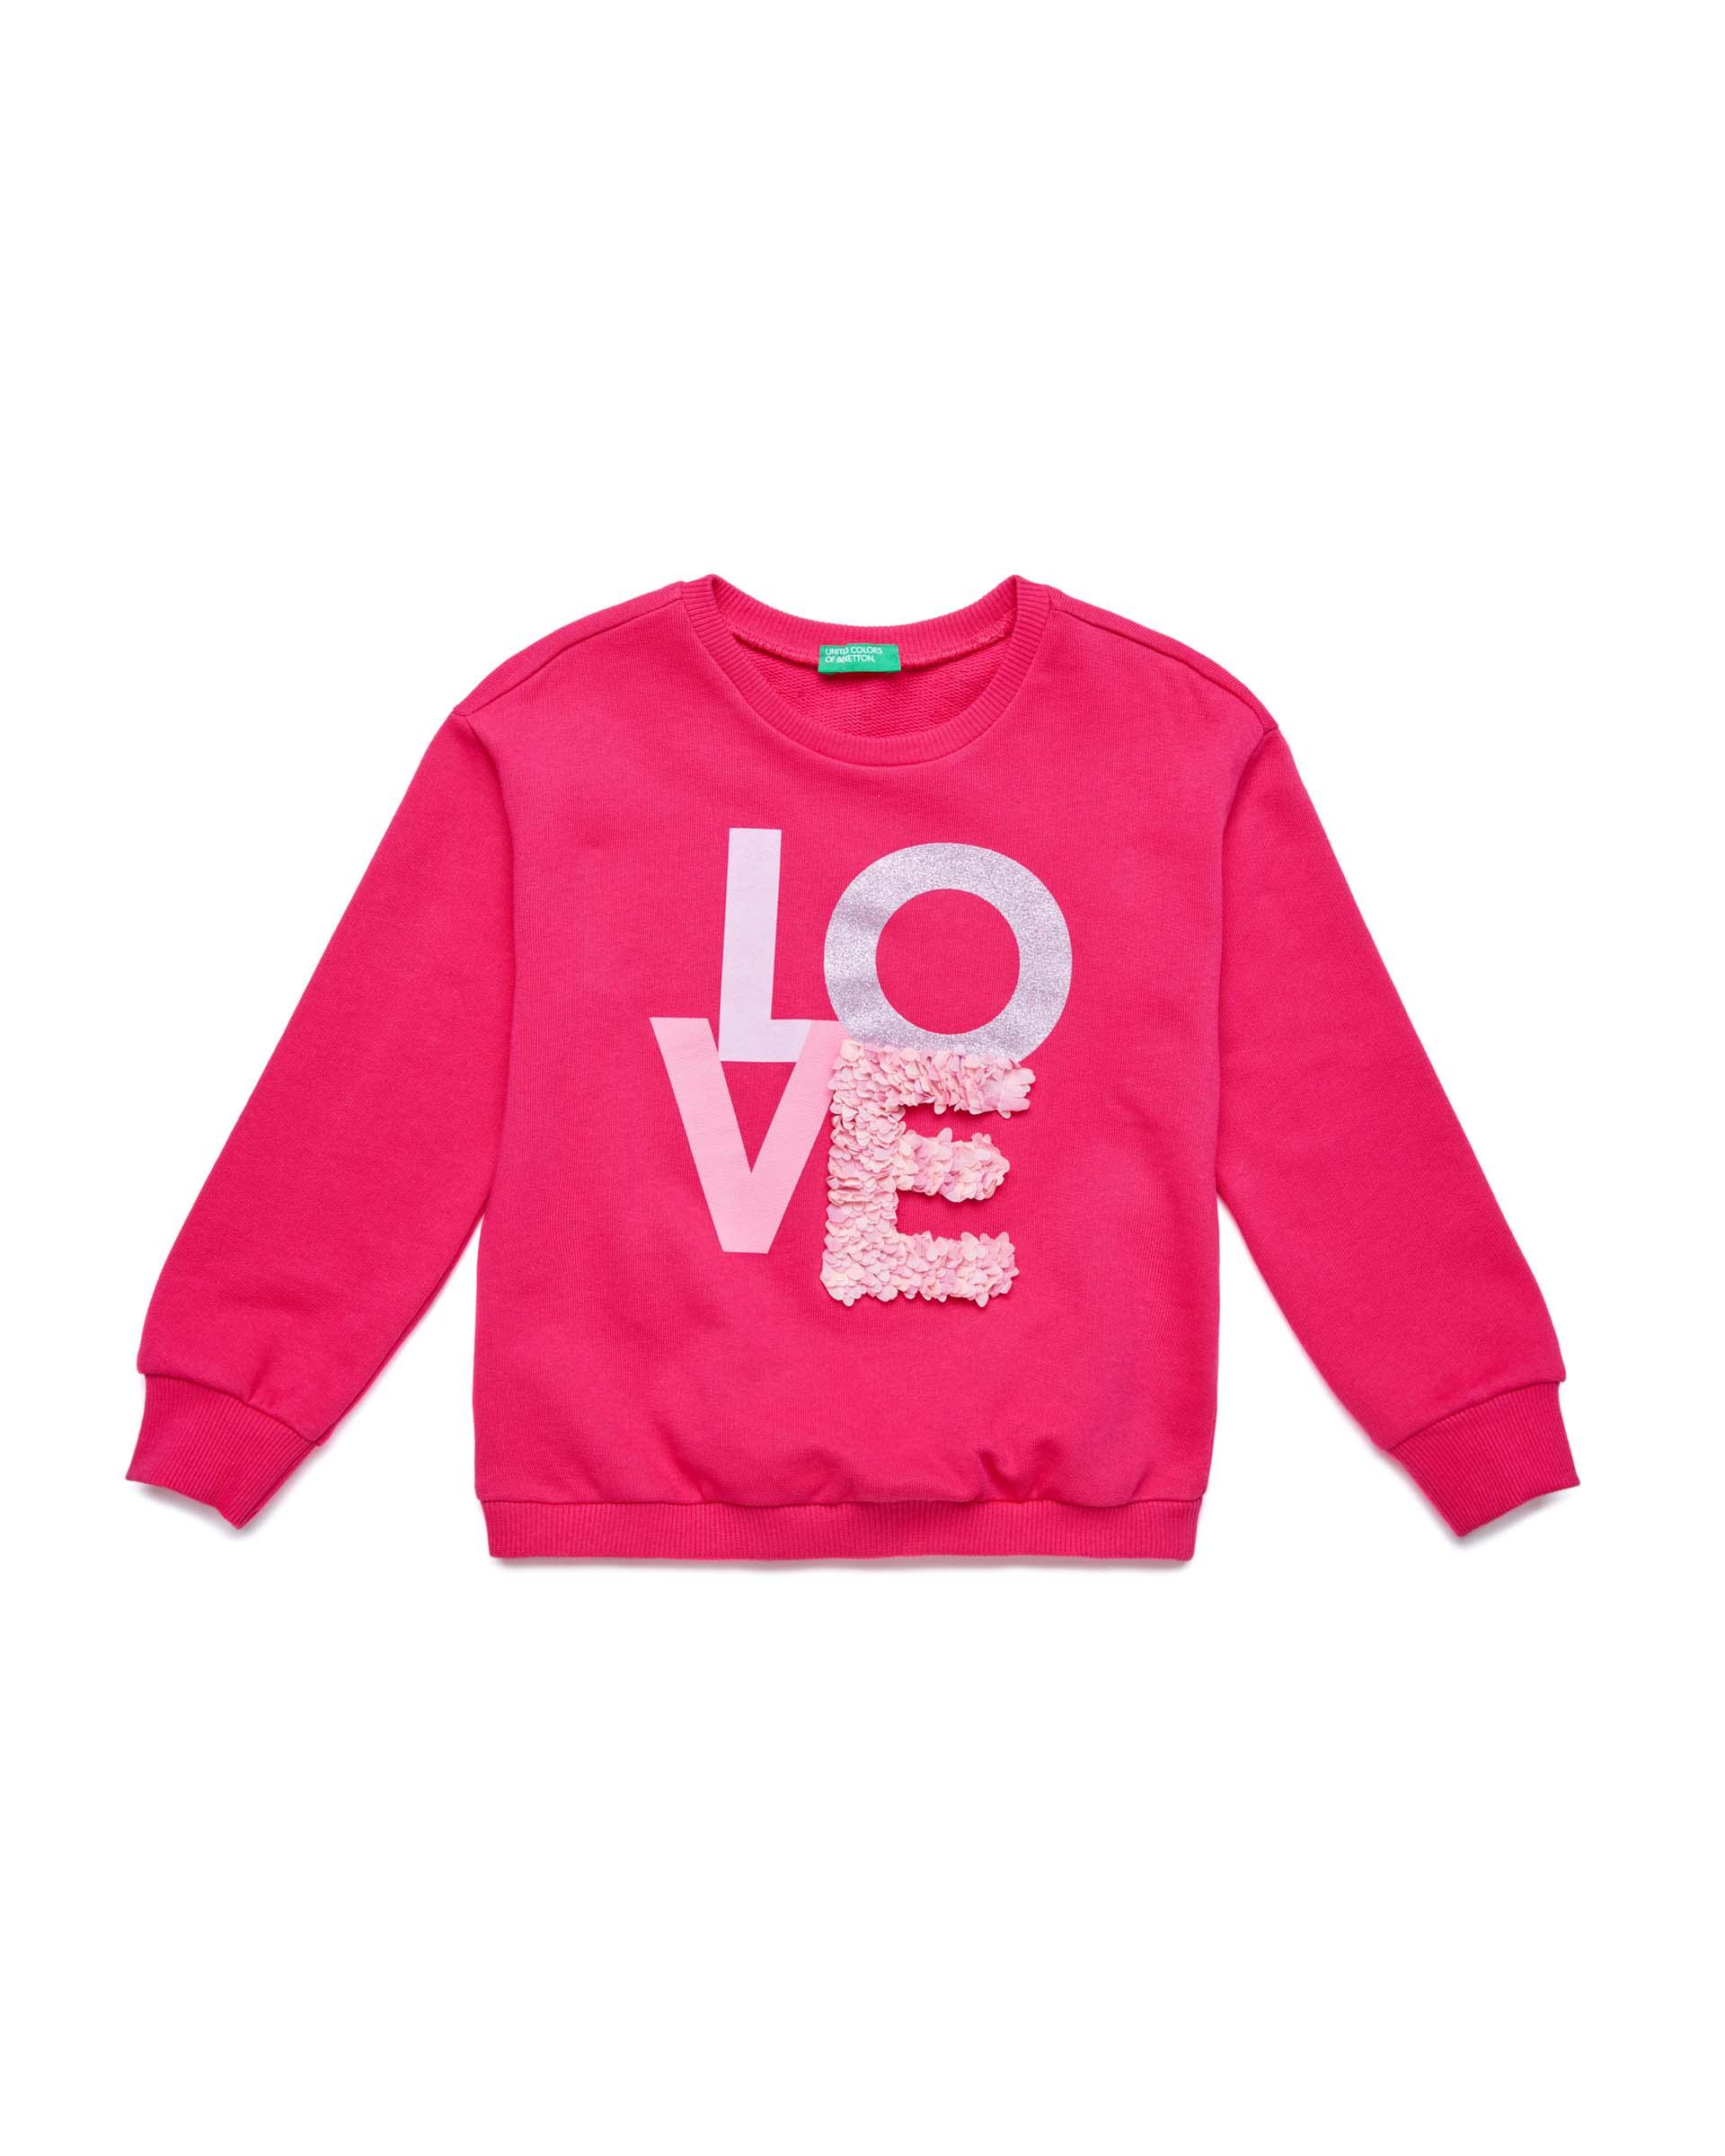 Купить 20P_3J68C14L2_2L3, Толстовка для девочек Benetton 3J68C14L2_2L3 р-р 140, United Colors of Benetton, Толстовки для девочек